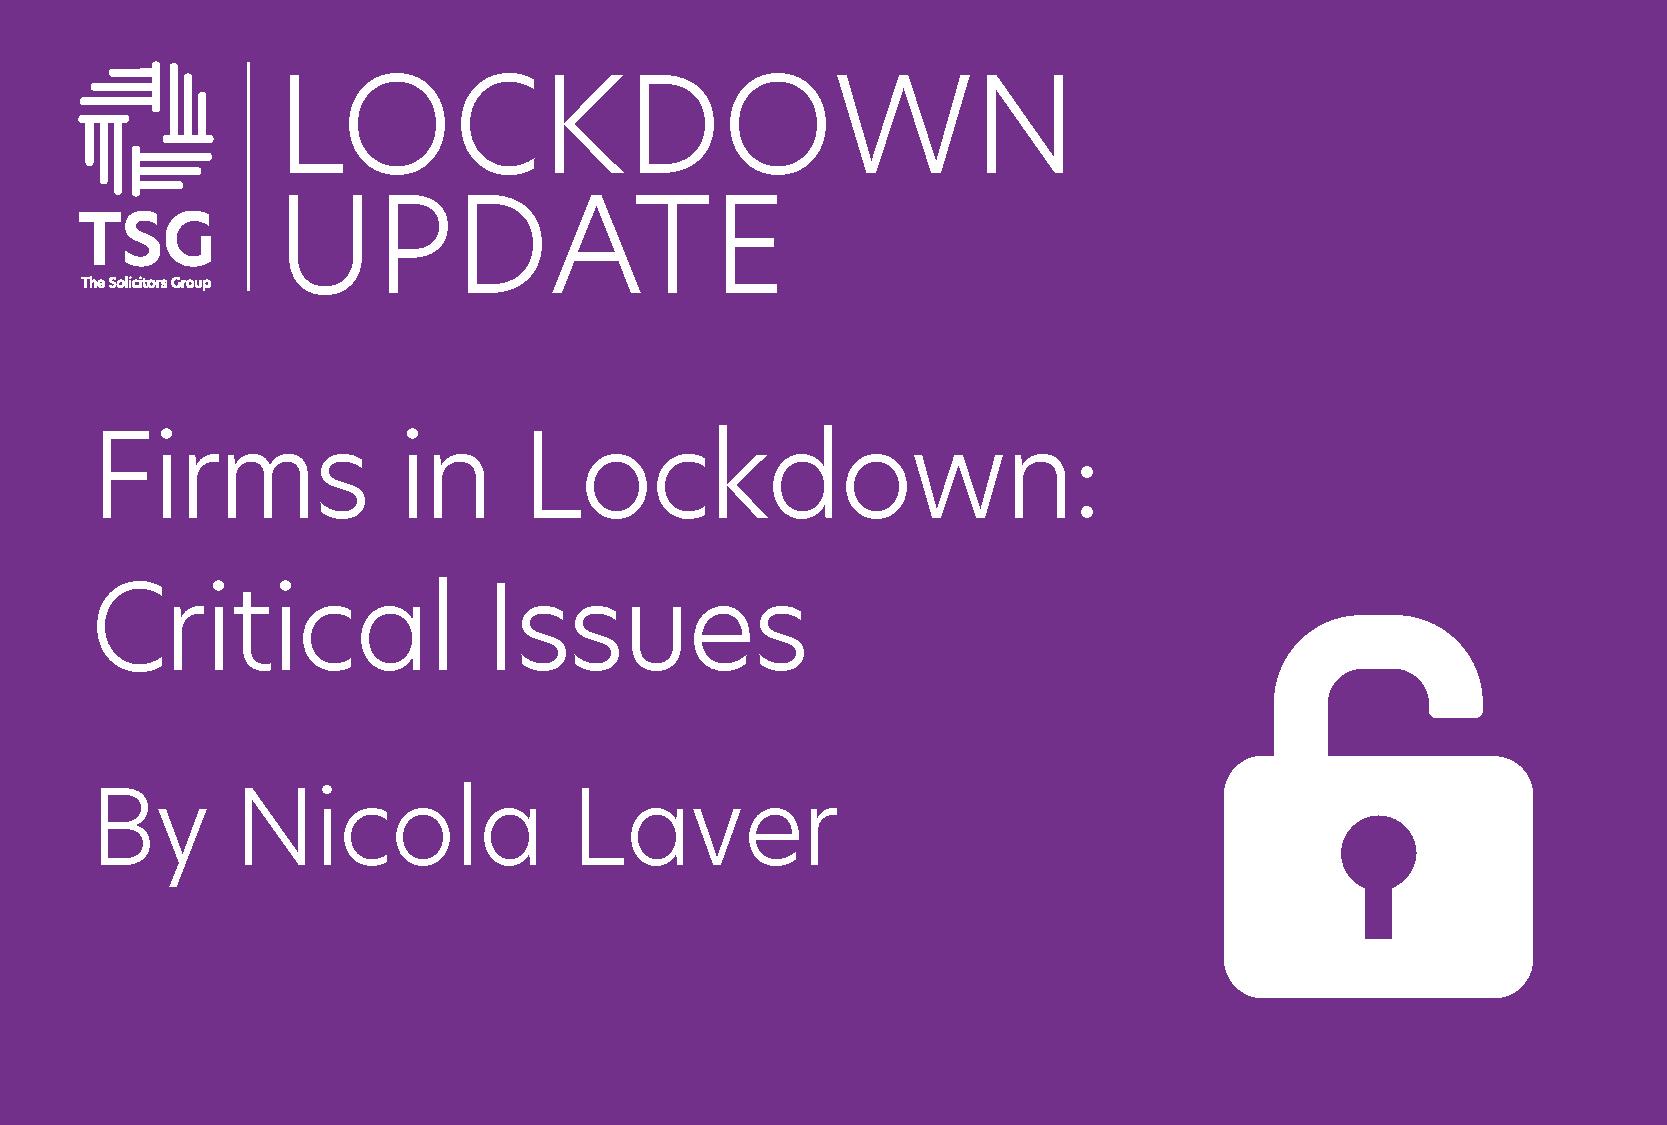 Firms in lockdown